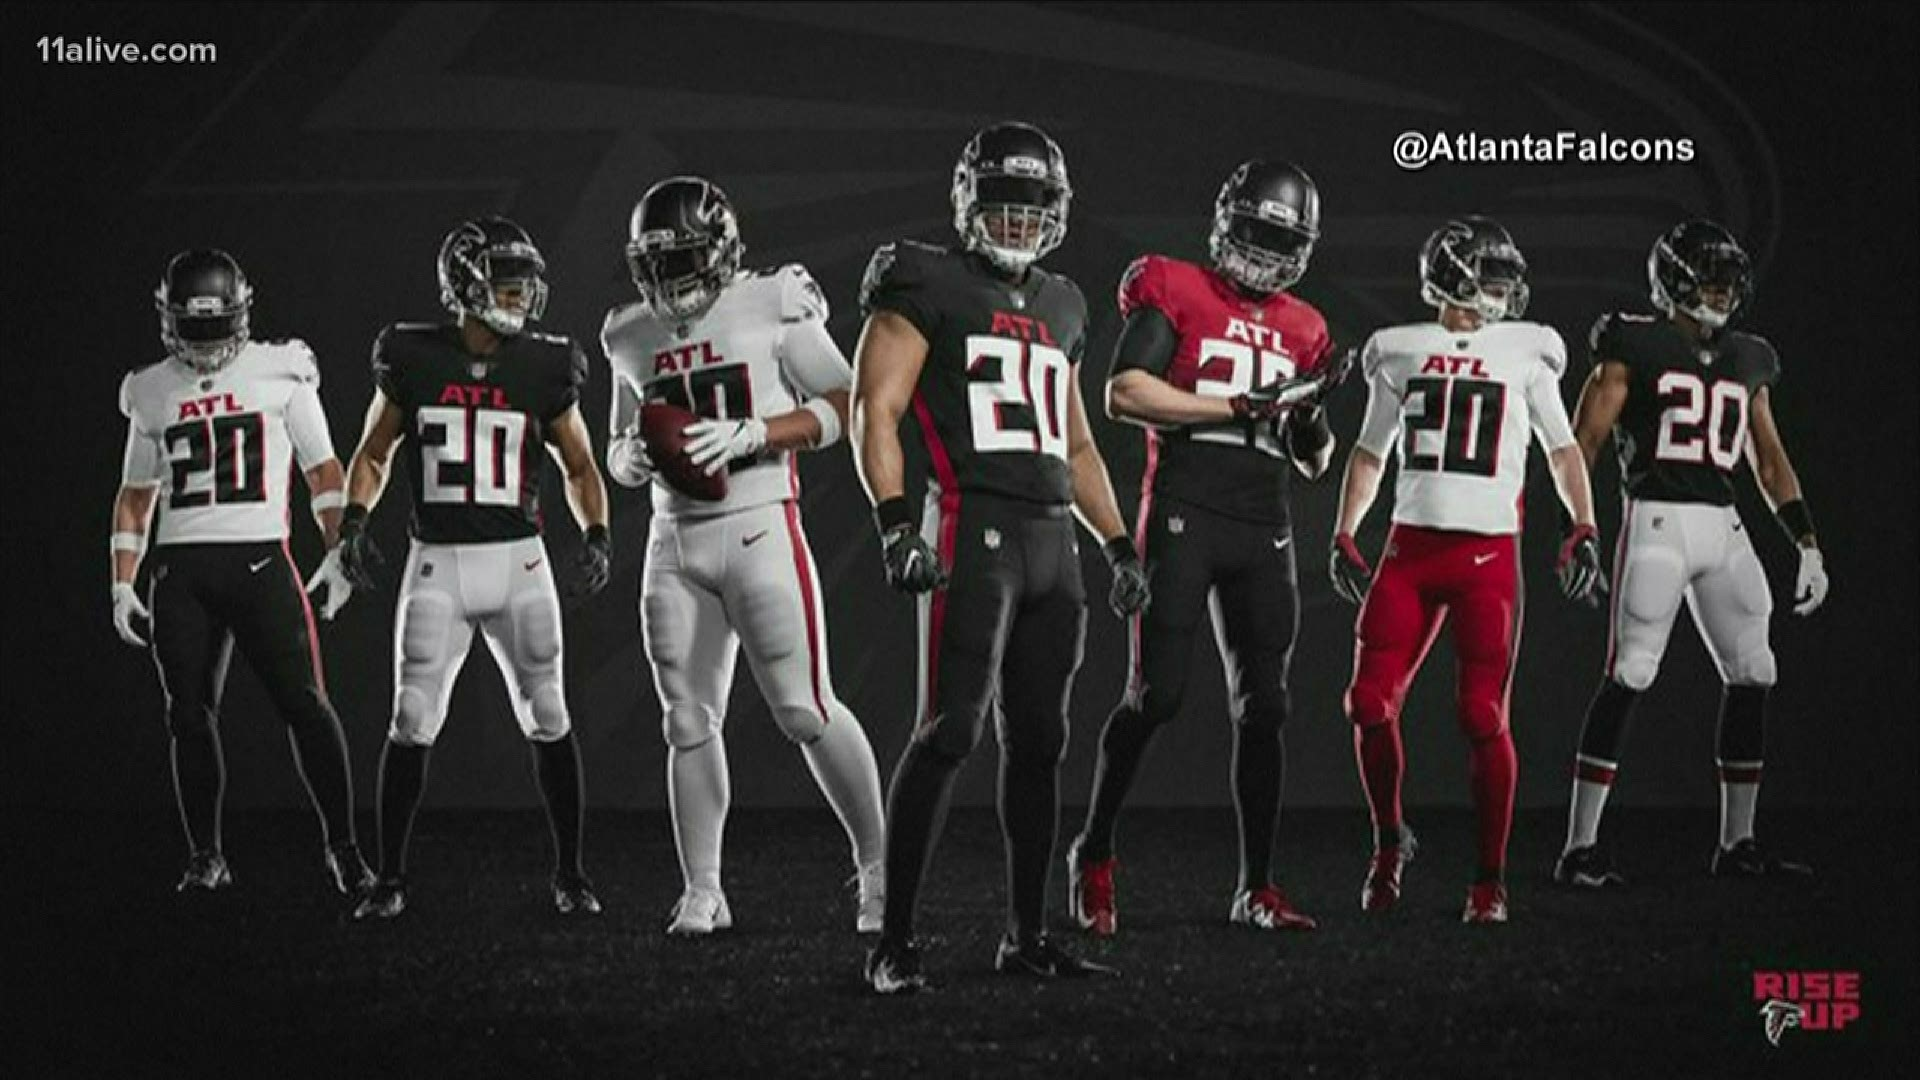 Atlanta Falcons 2020 Season Schedule